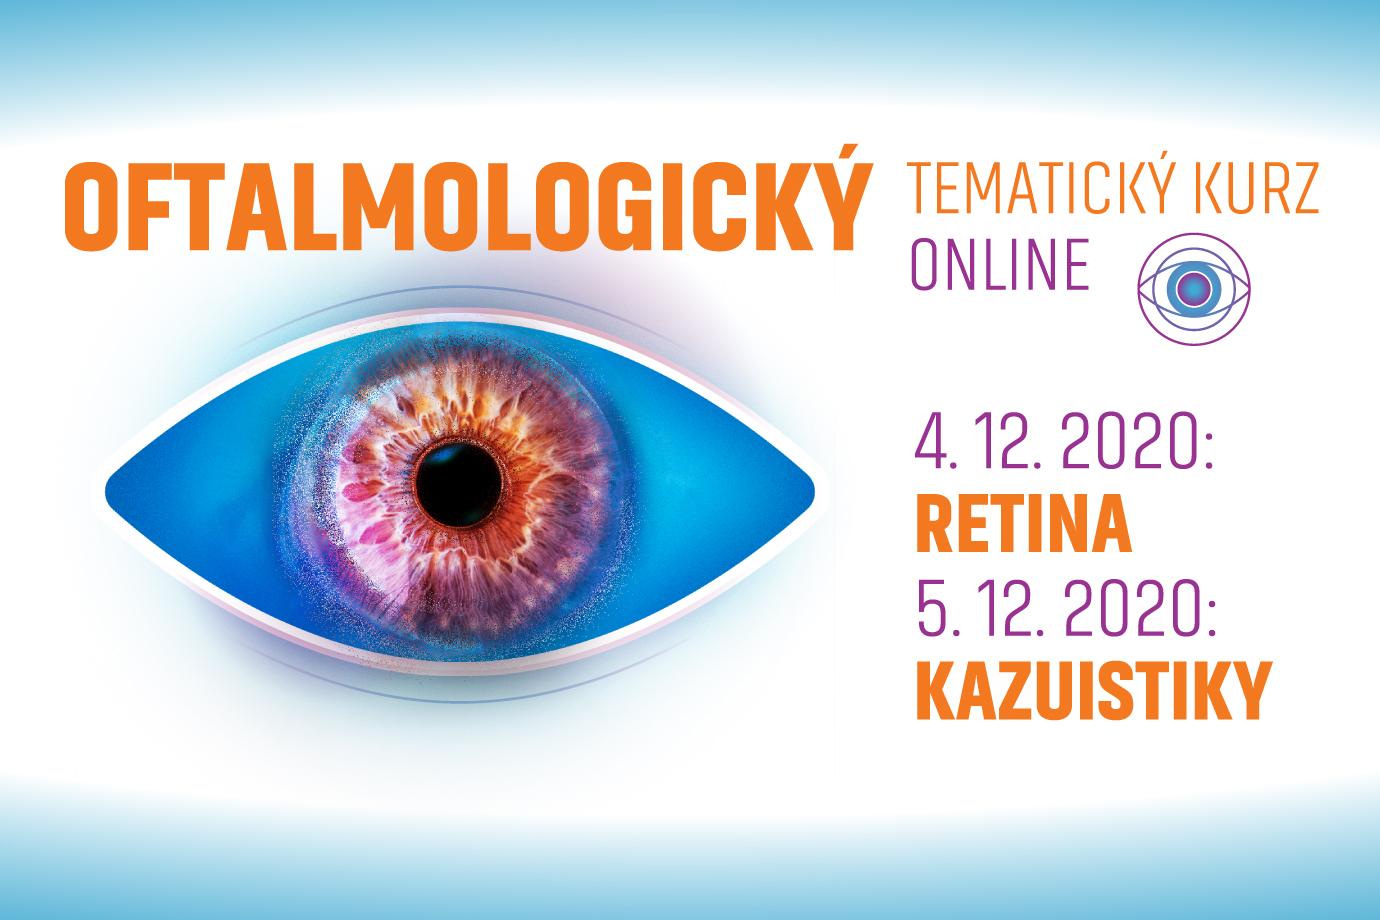 Oftalmologický tematický kurz